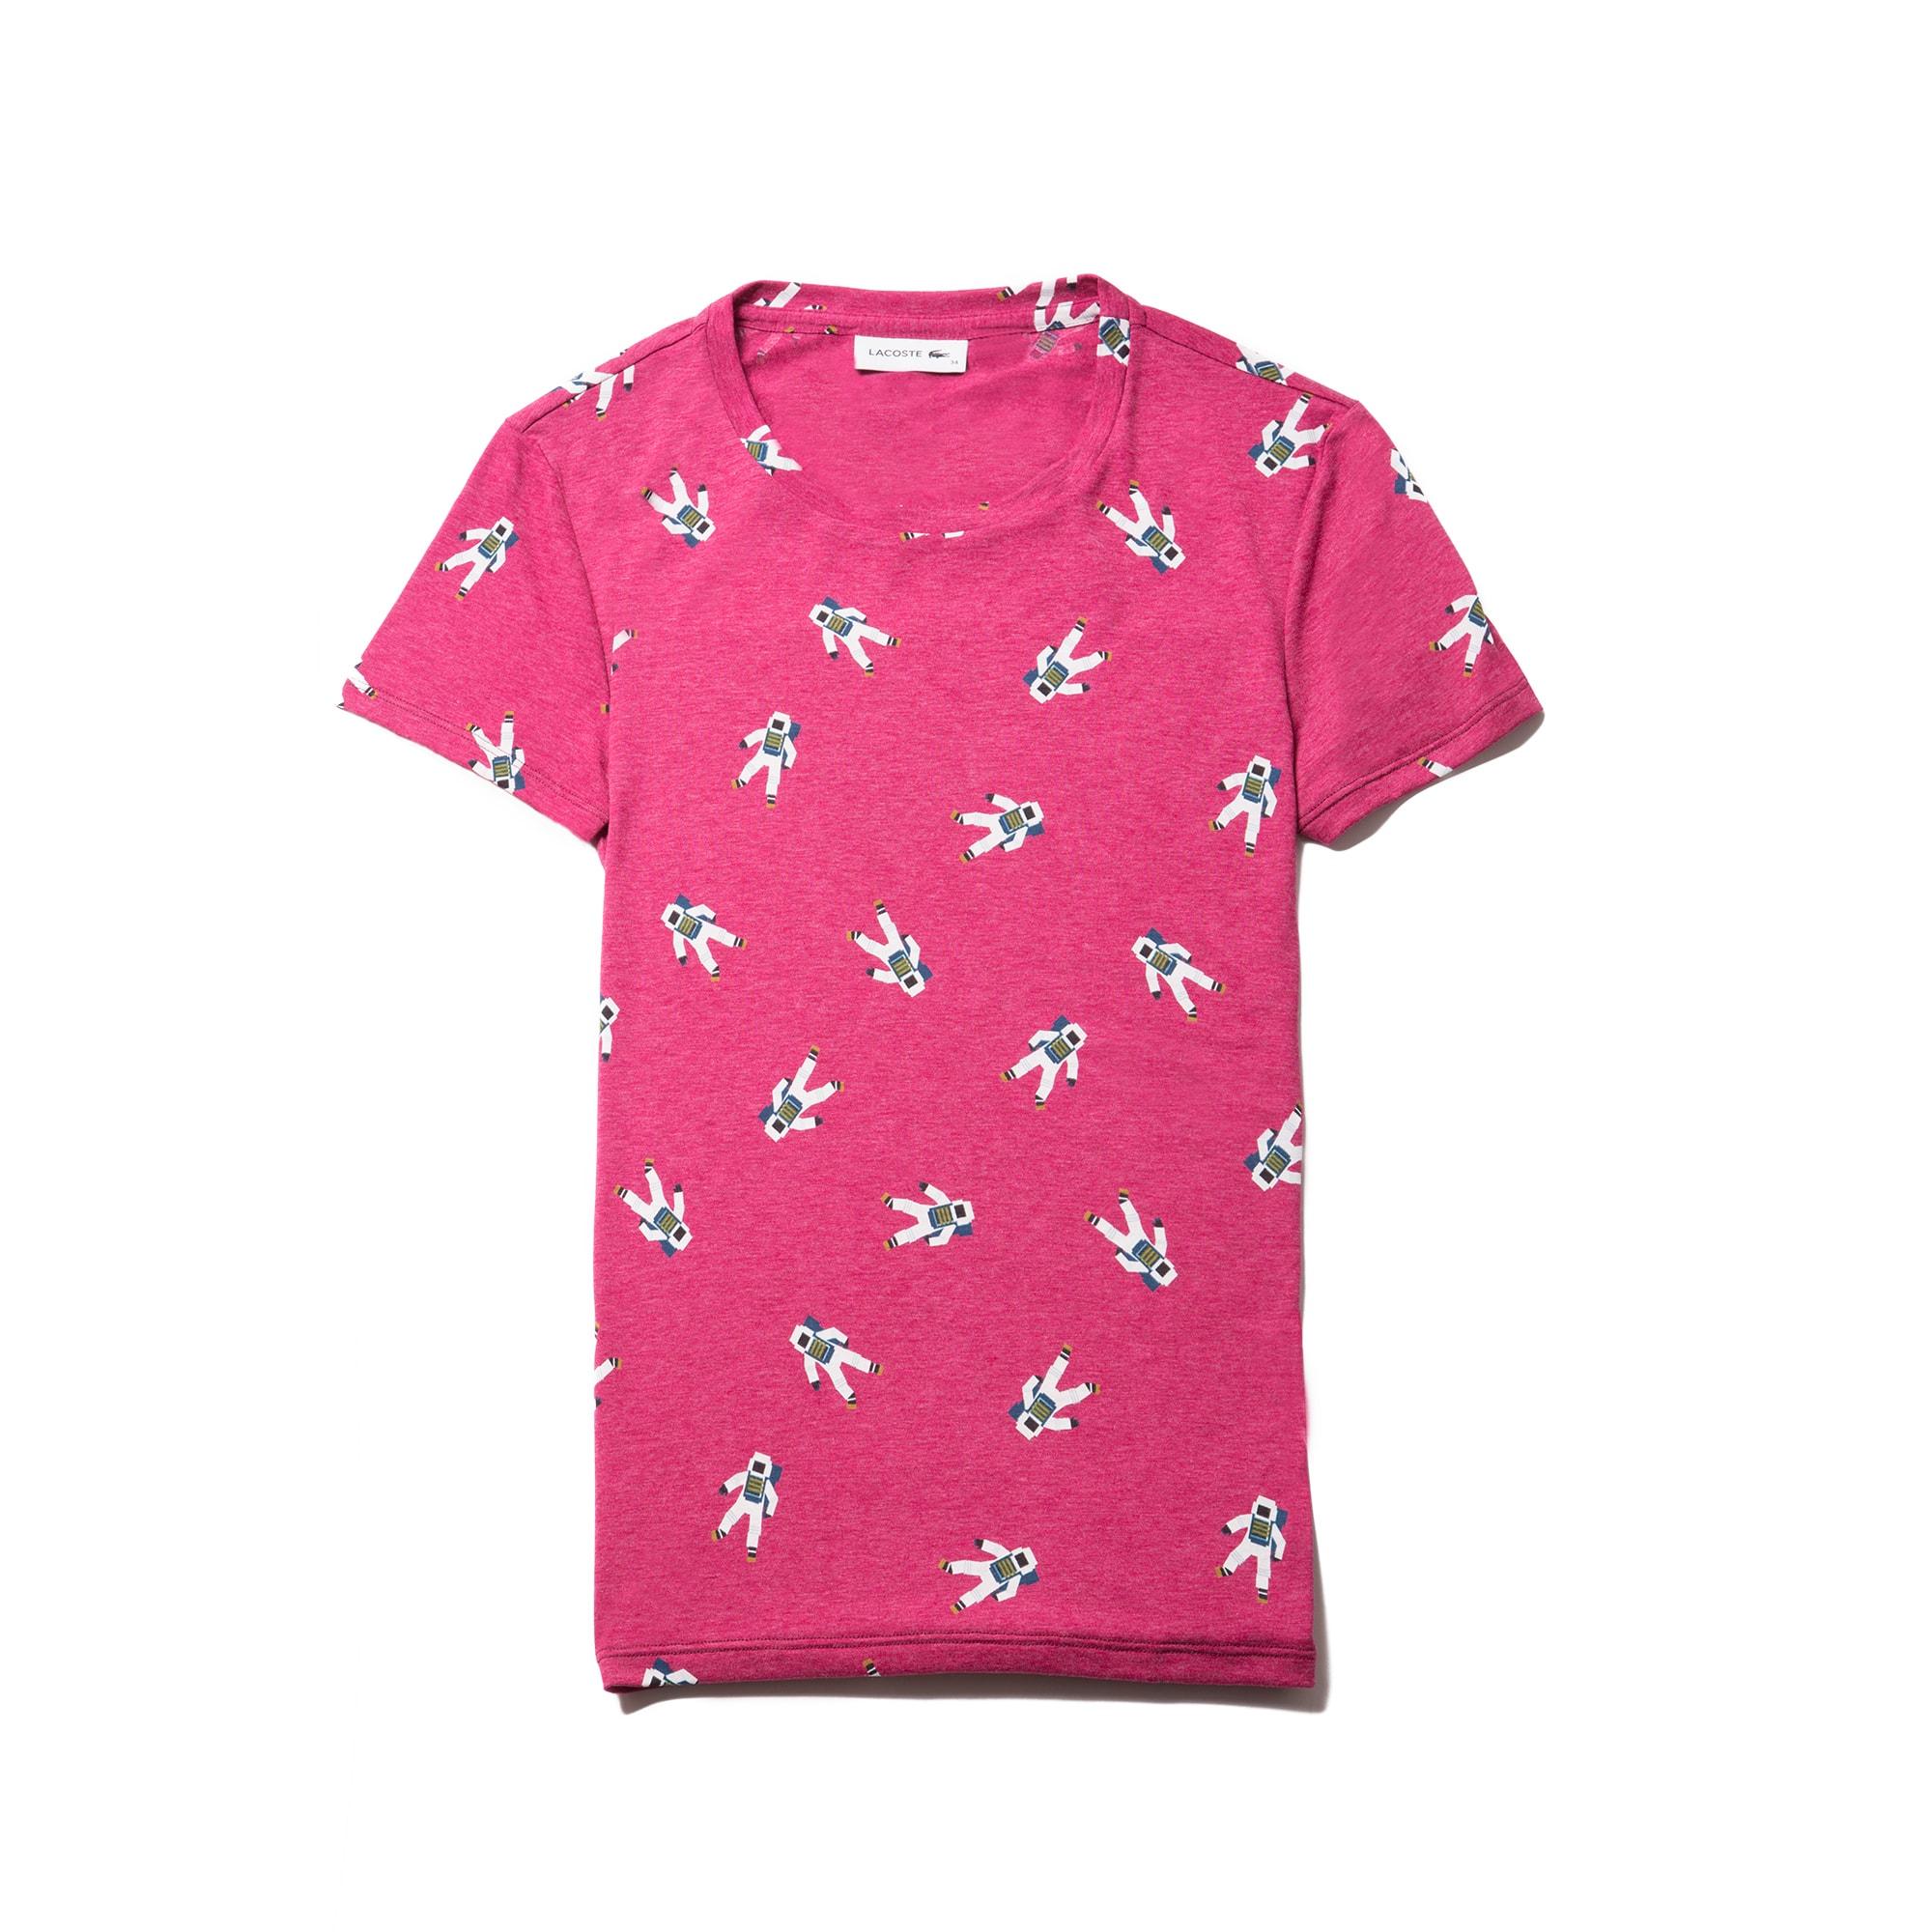 Women's Crew Neck Astronaut Print Flowing Jersey T-shirt